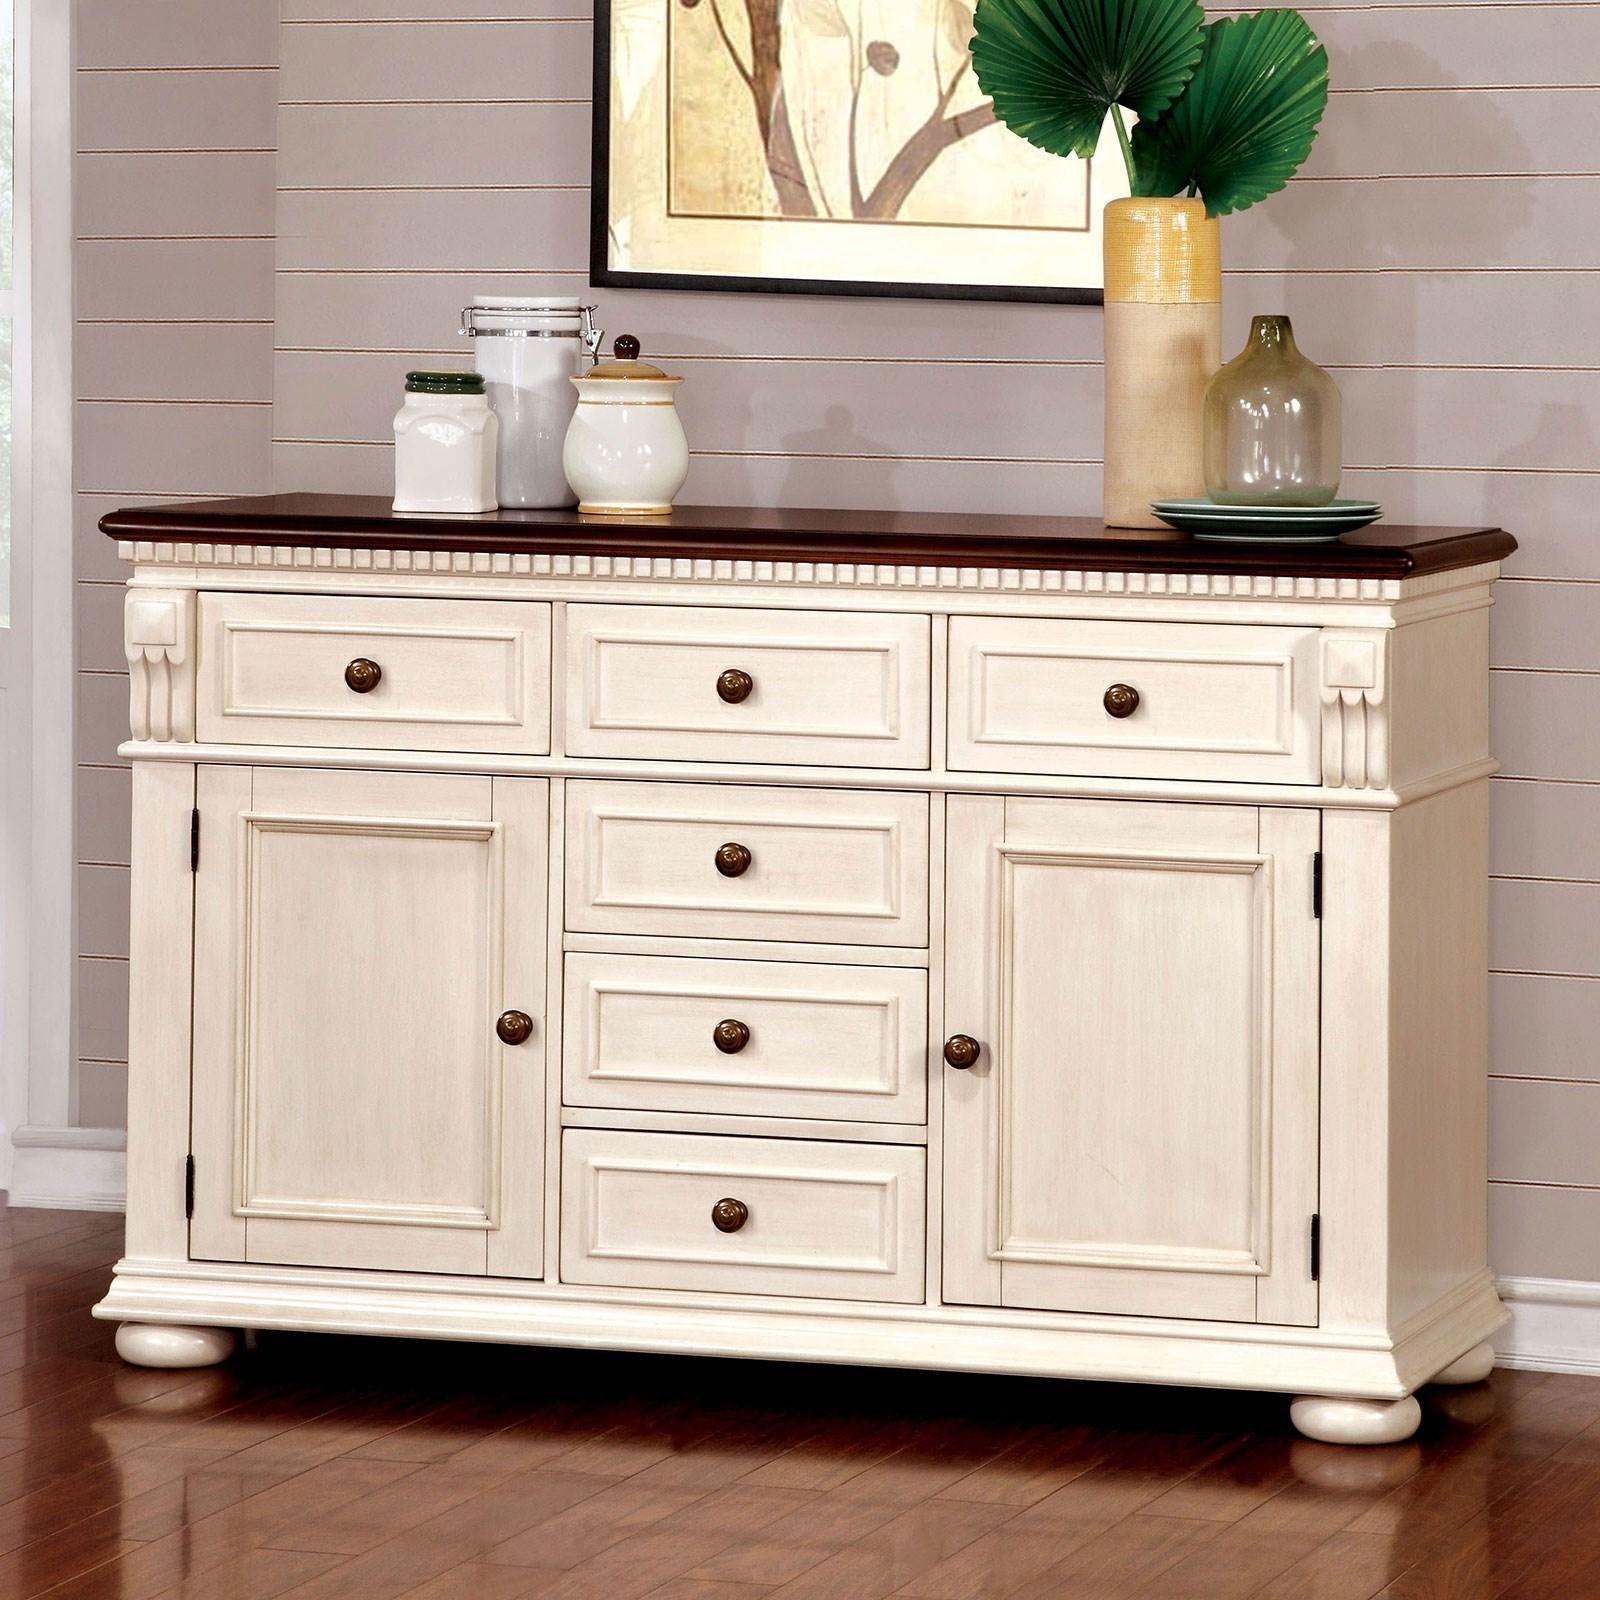 Sabrina Server by Furniture of America at Nassau Furniture and Mattress